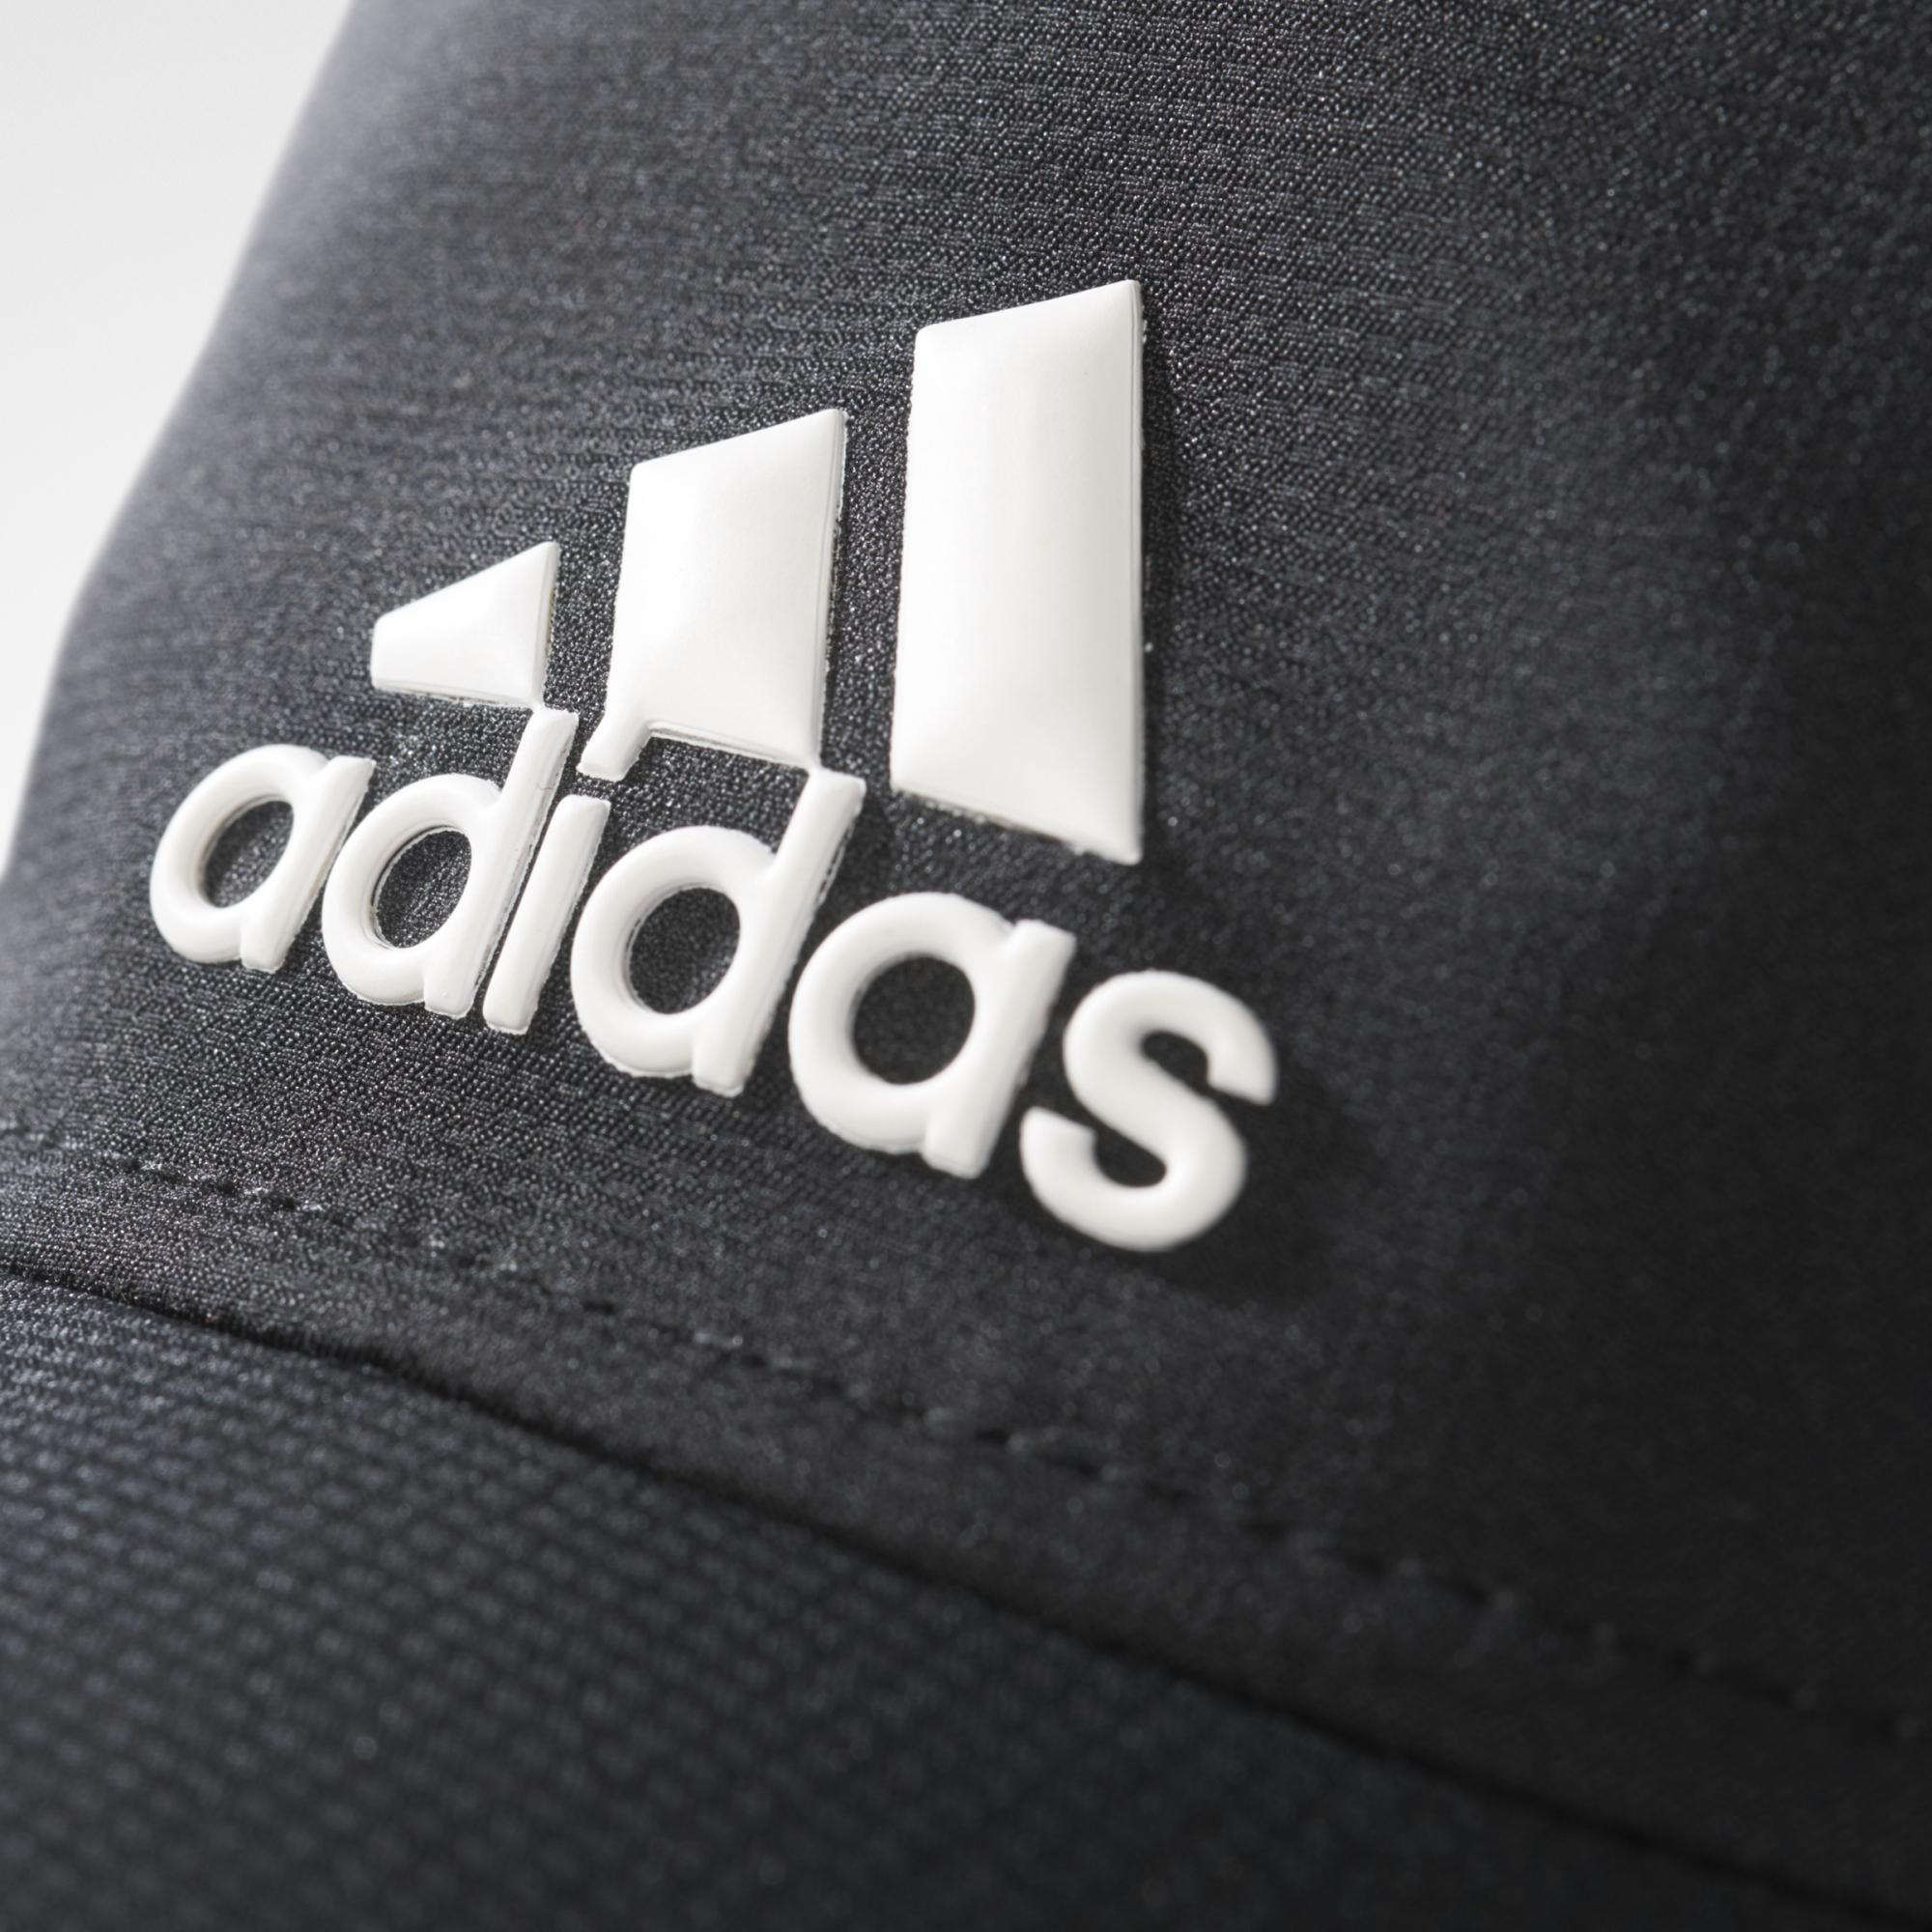 6b2113cbd19 Adidas Classic Six-Panel Climalite Cap - Black - Tennisnuts.com